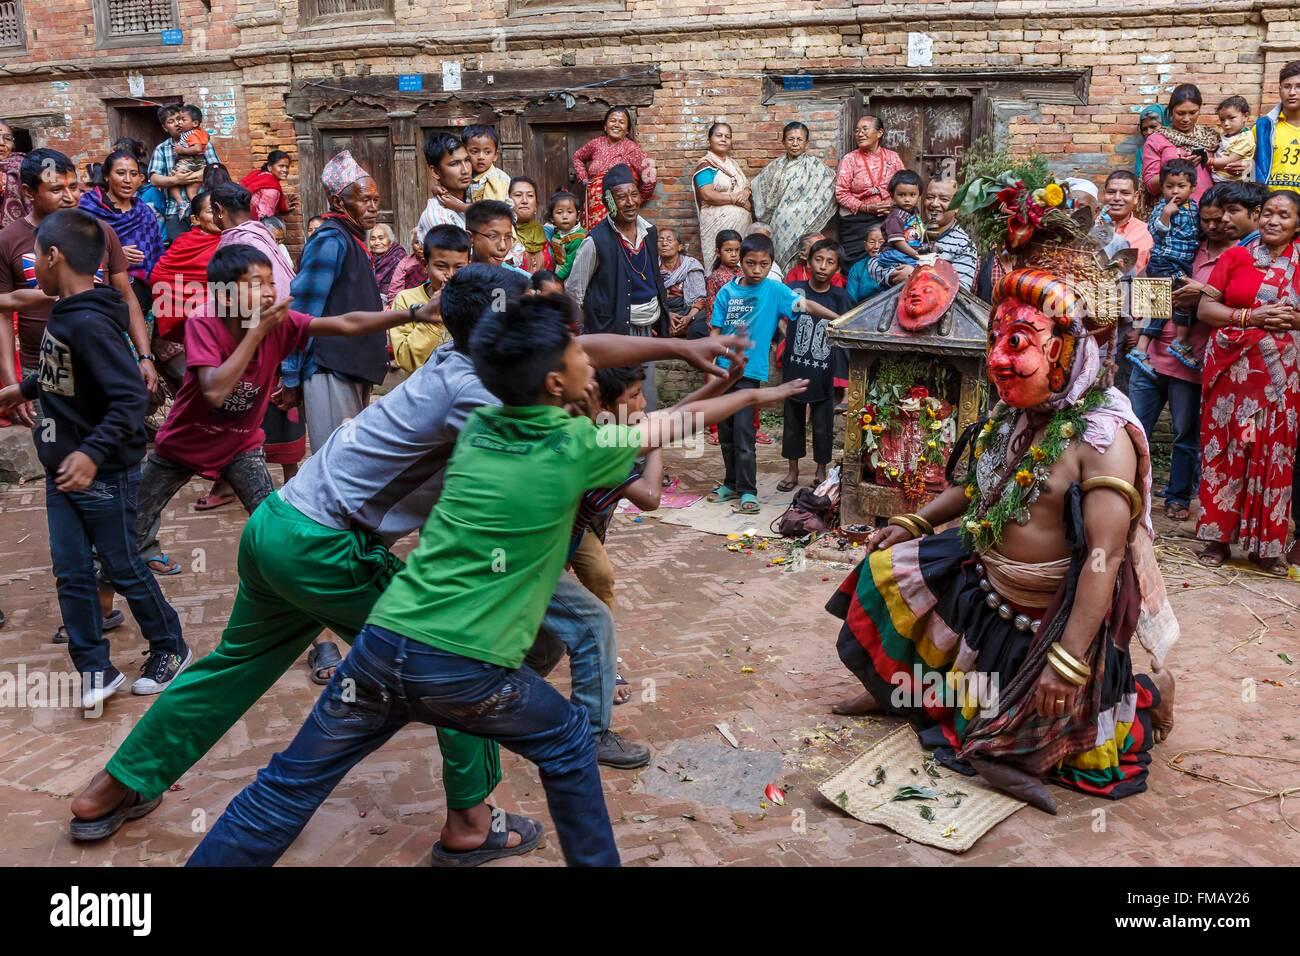 Nepal, Bagmati zone, Bhaktapur, kids and a street actor - Stock Image